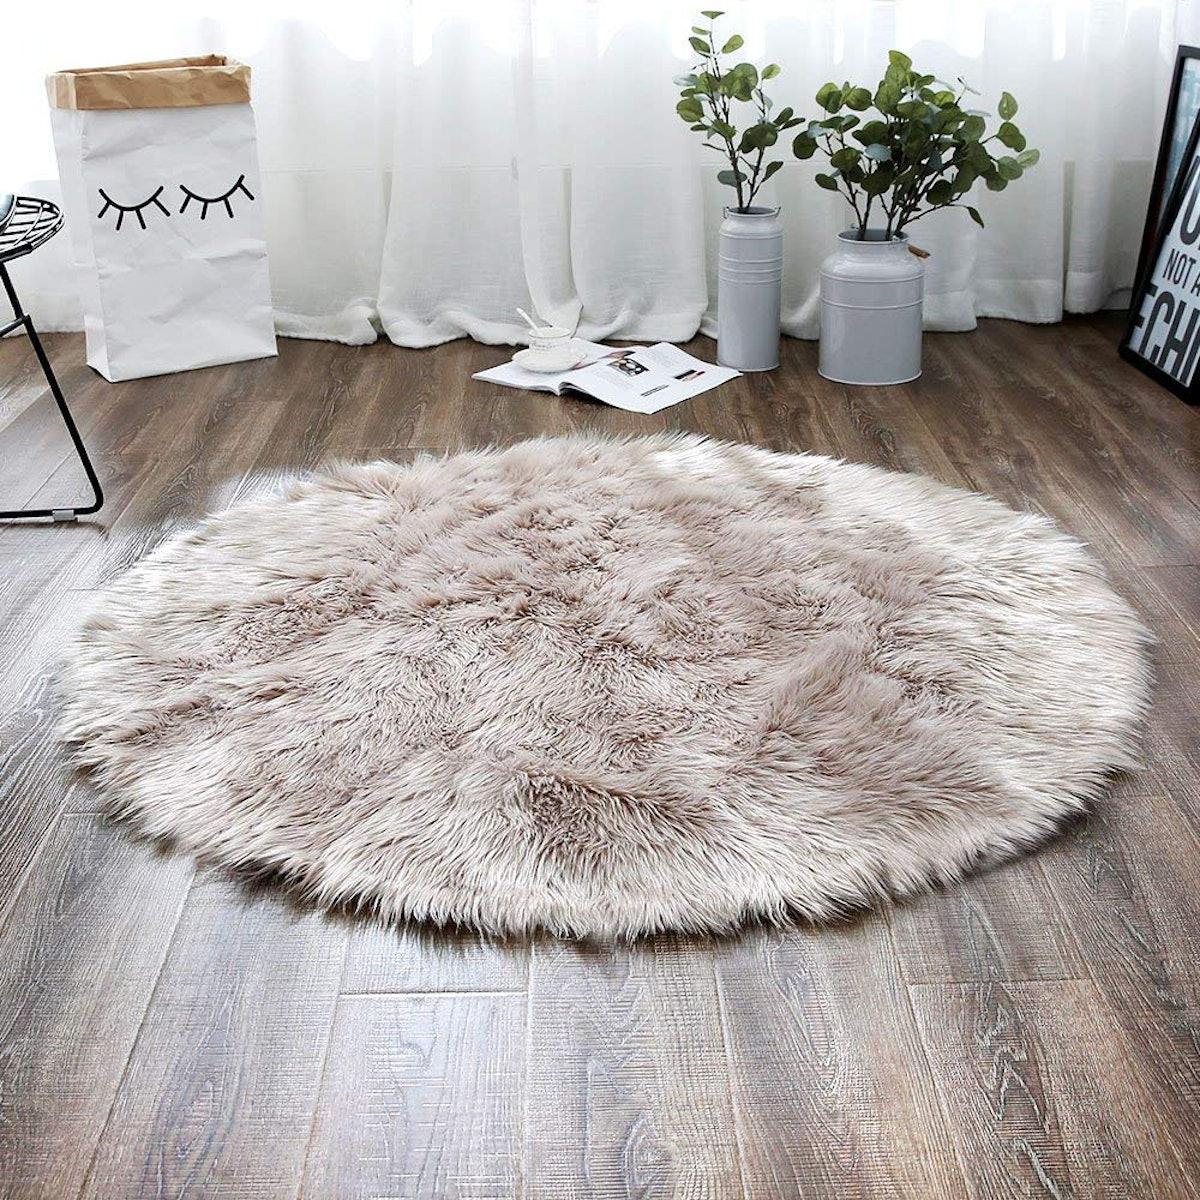 LEEVAN Plush Faux Fur Rug